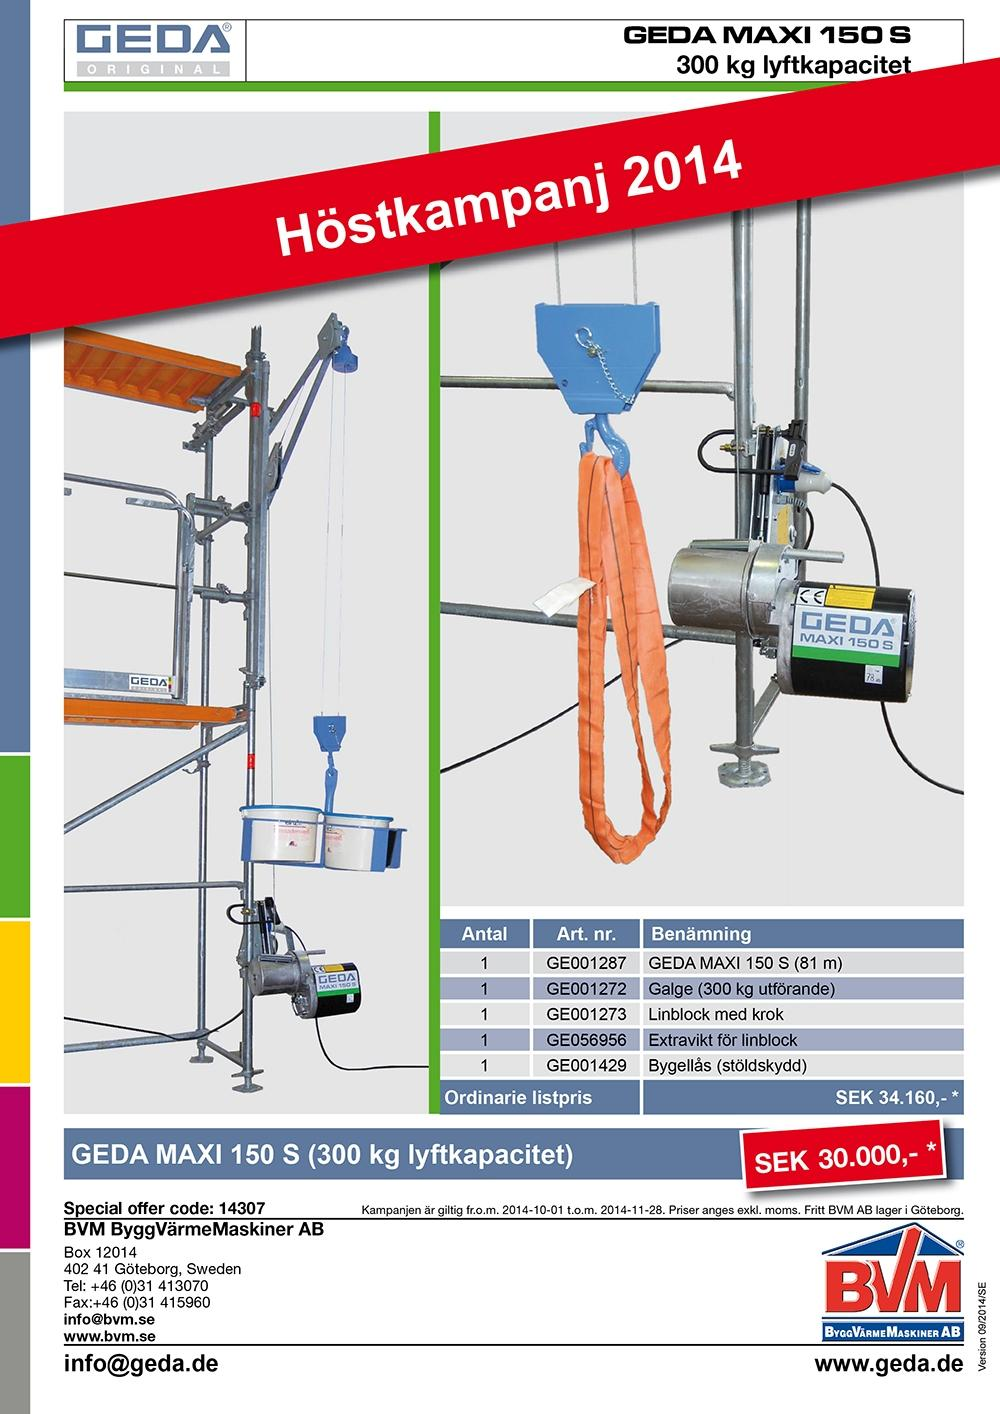 Höstkampanj GEDA Maxi 150 S / 300 kg